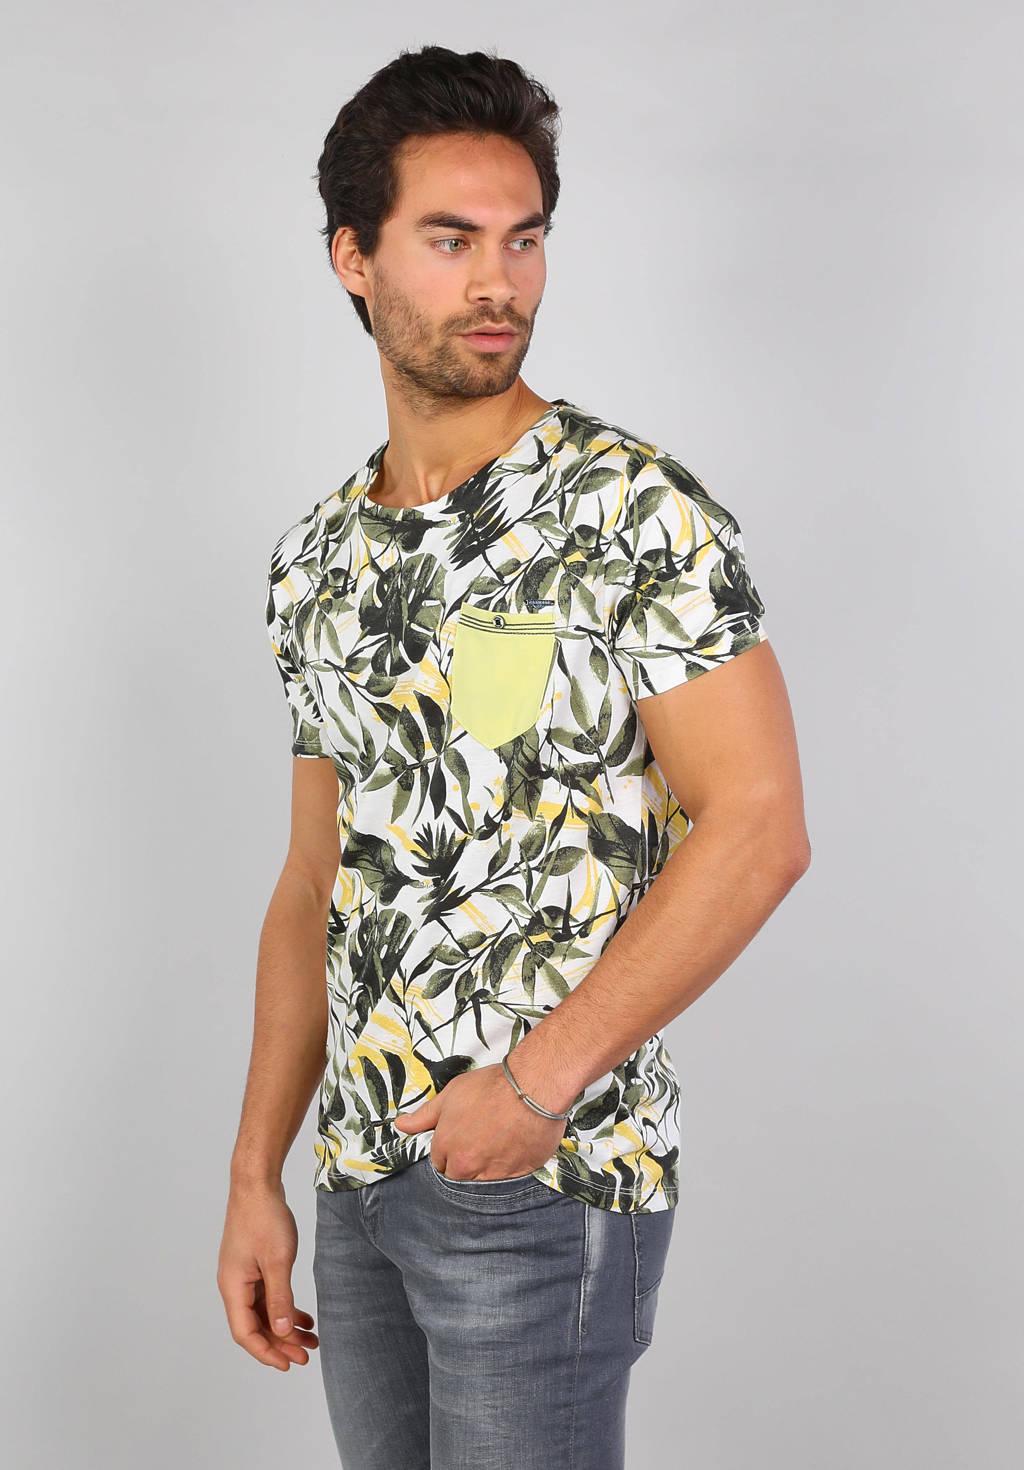 GABBIANO T-shirt met bladprint wit/lichtgeel/kaki, Wit/lichtgeel/kaki